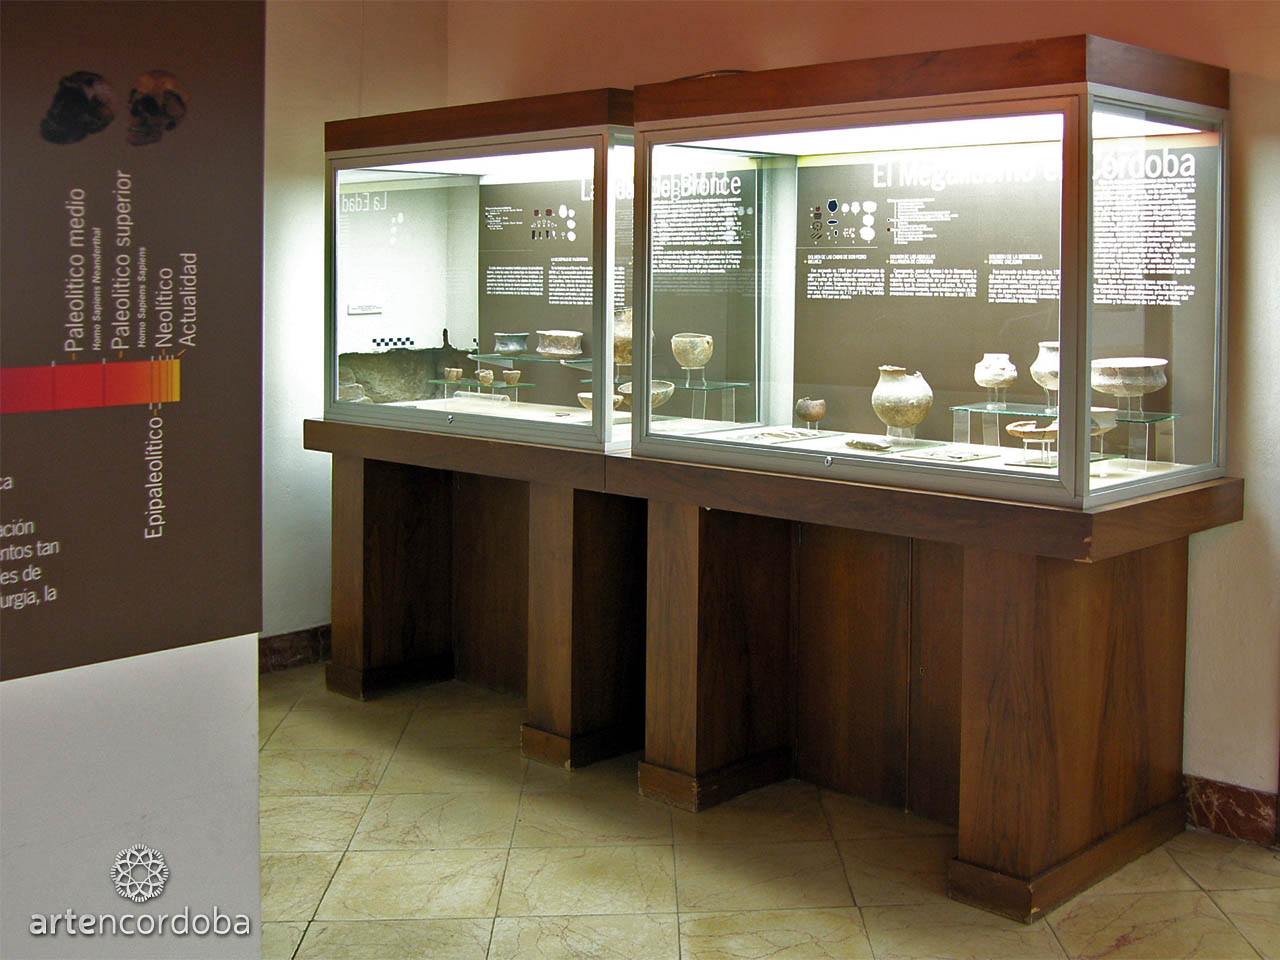 Sala de Prehistoria del Museo Arqueológico de Córdoba